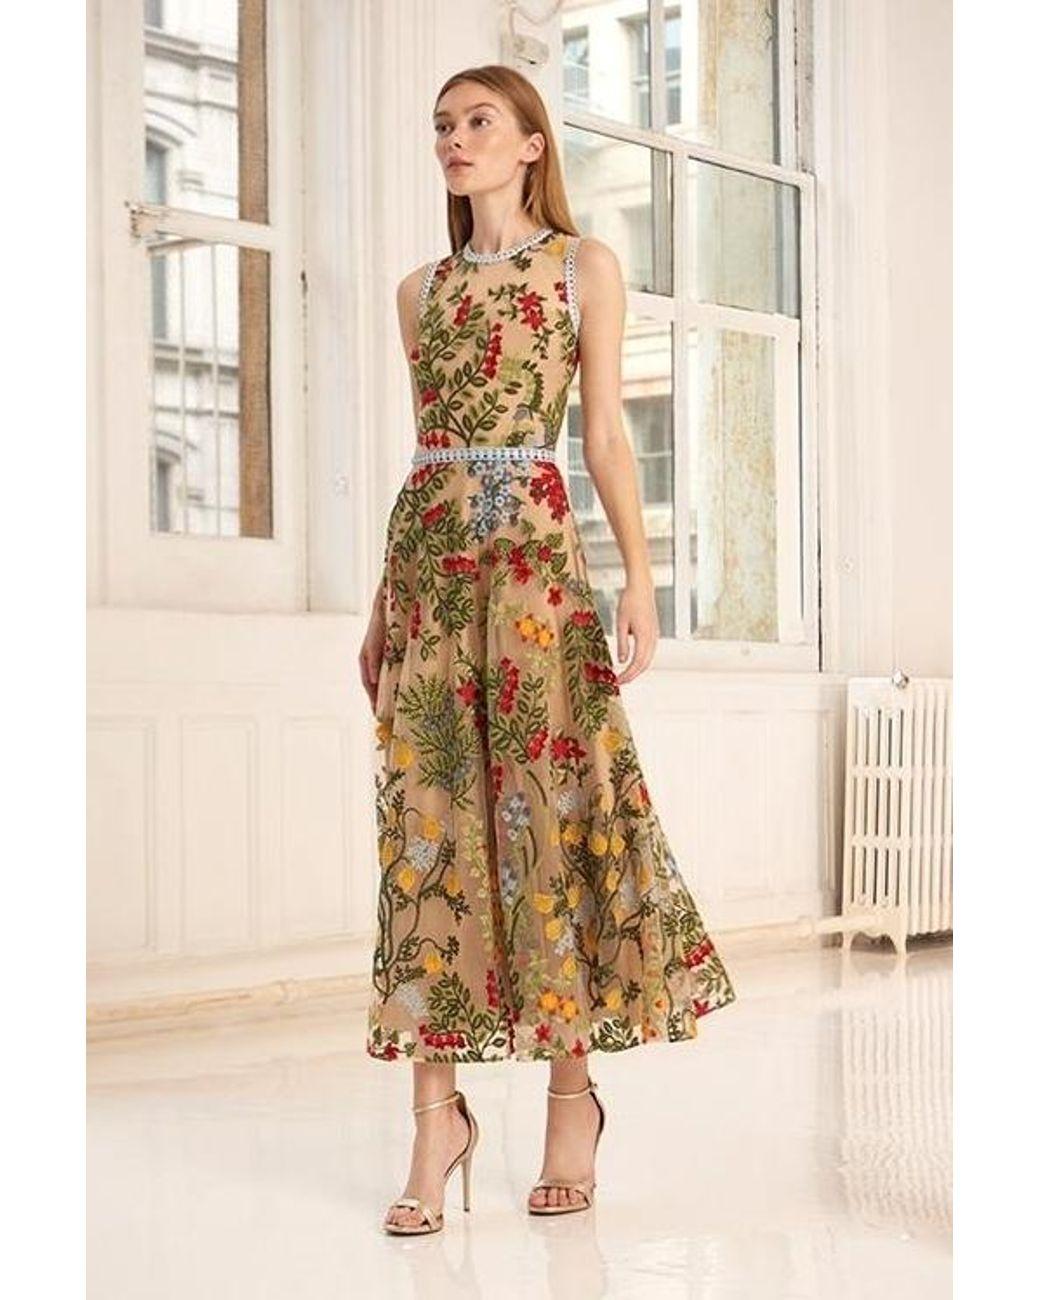 2c846166ea1 Lyst - ML Monique Lhuillier Sleeveless Floral Midi Dress in Natural